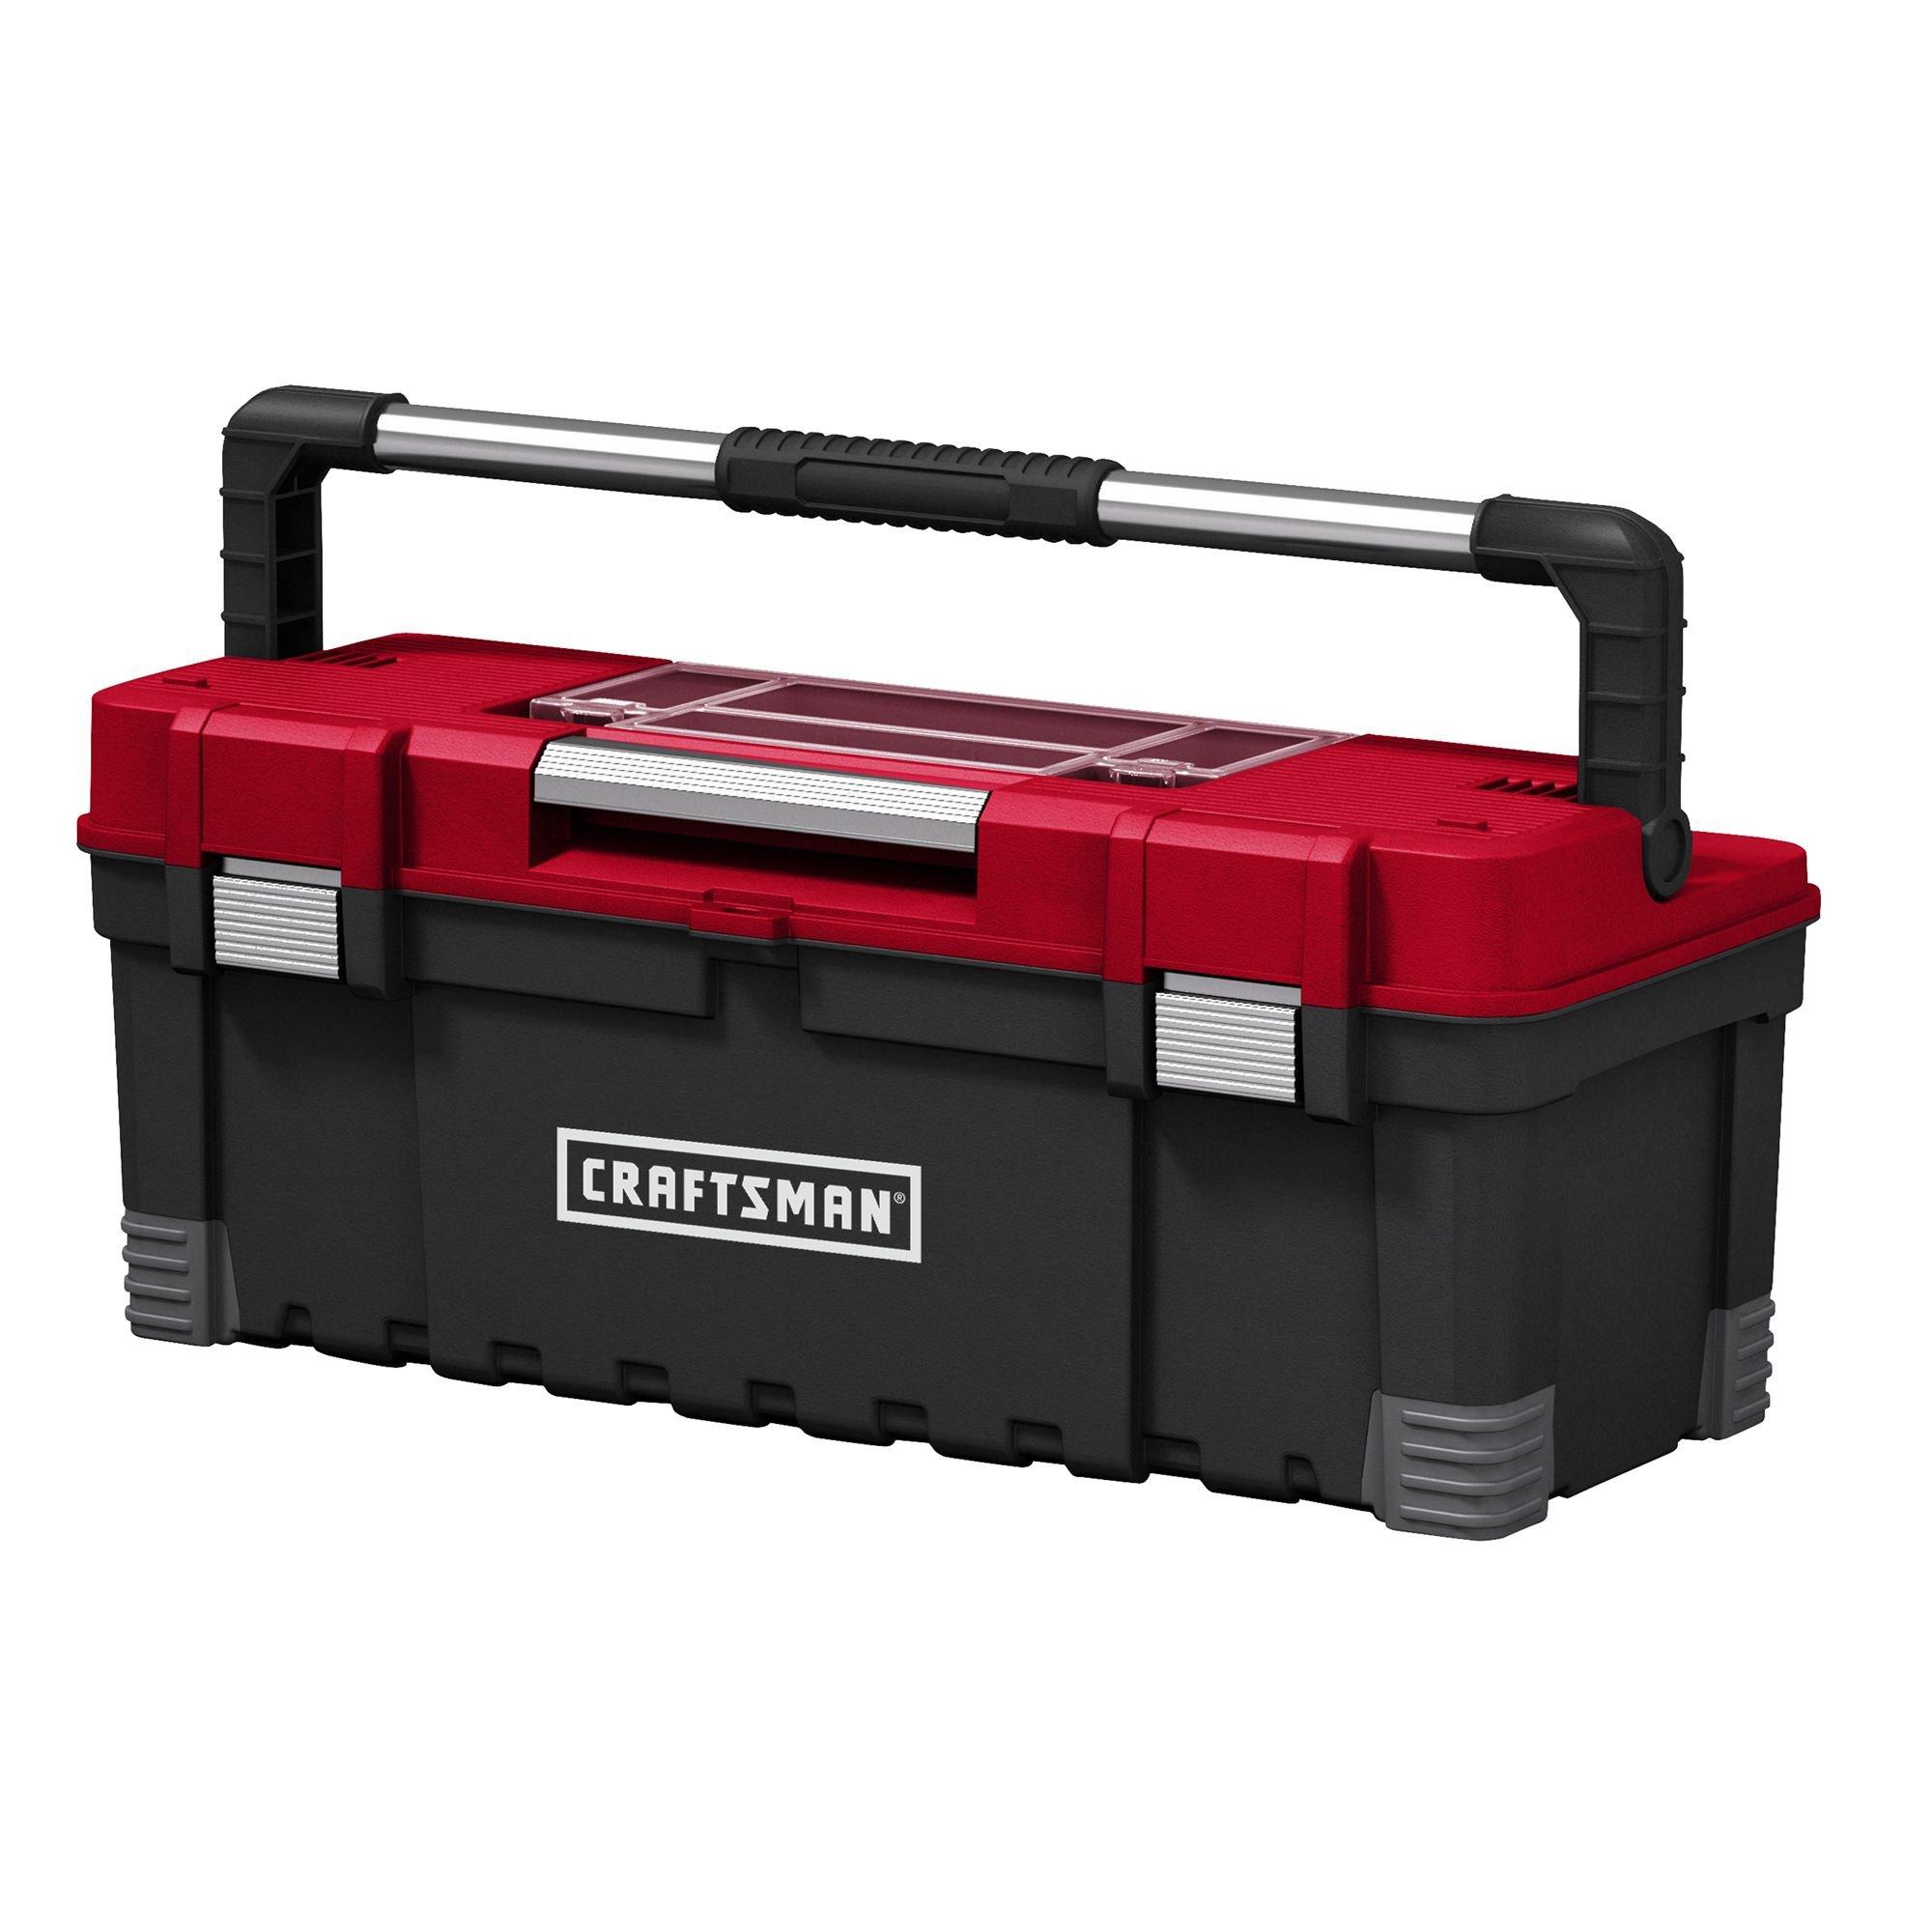 Craftsman 26 In. Power Latch Tool Box